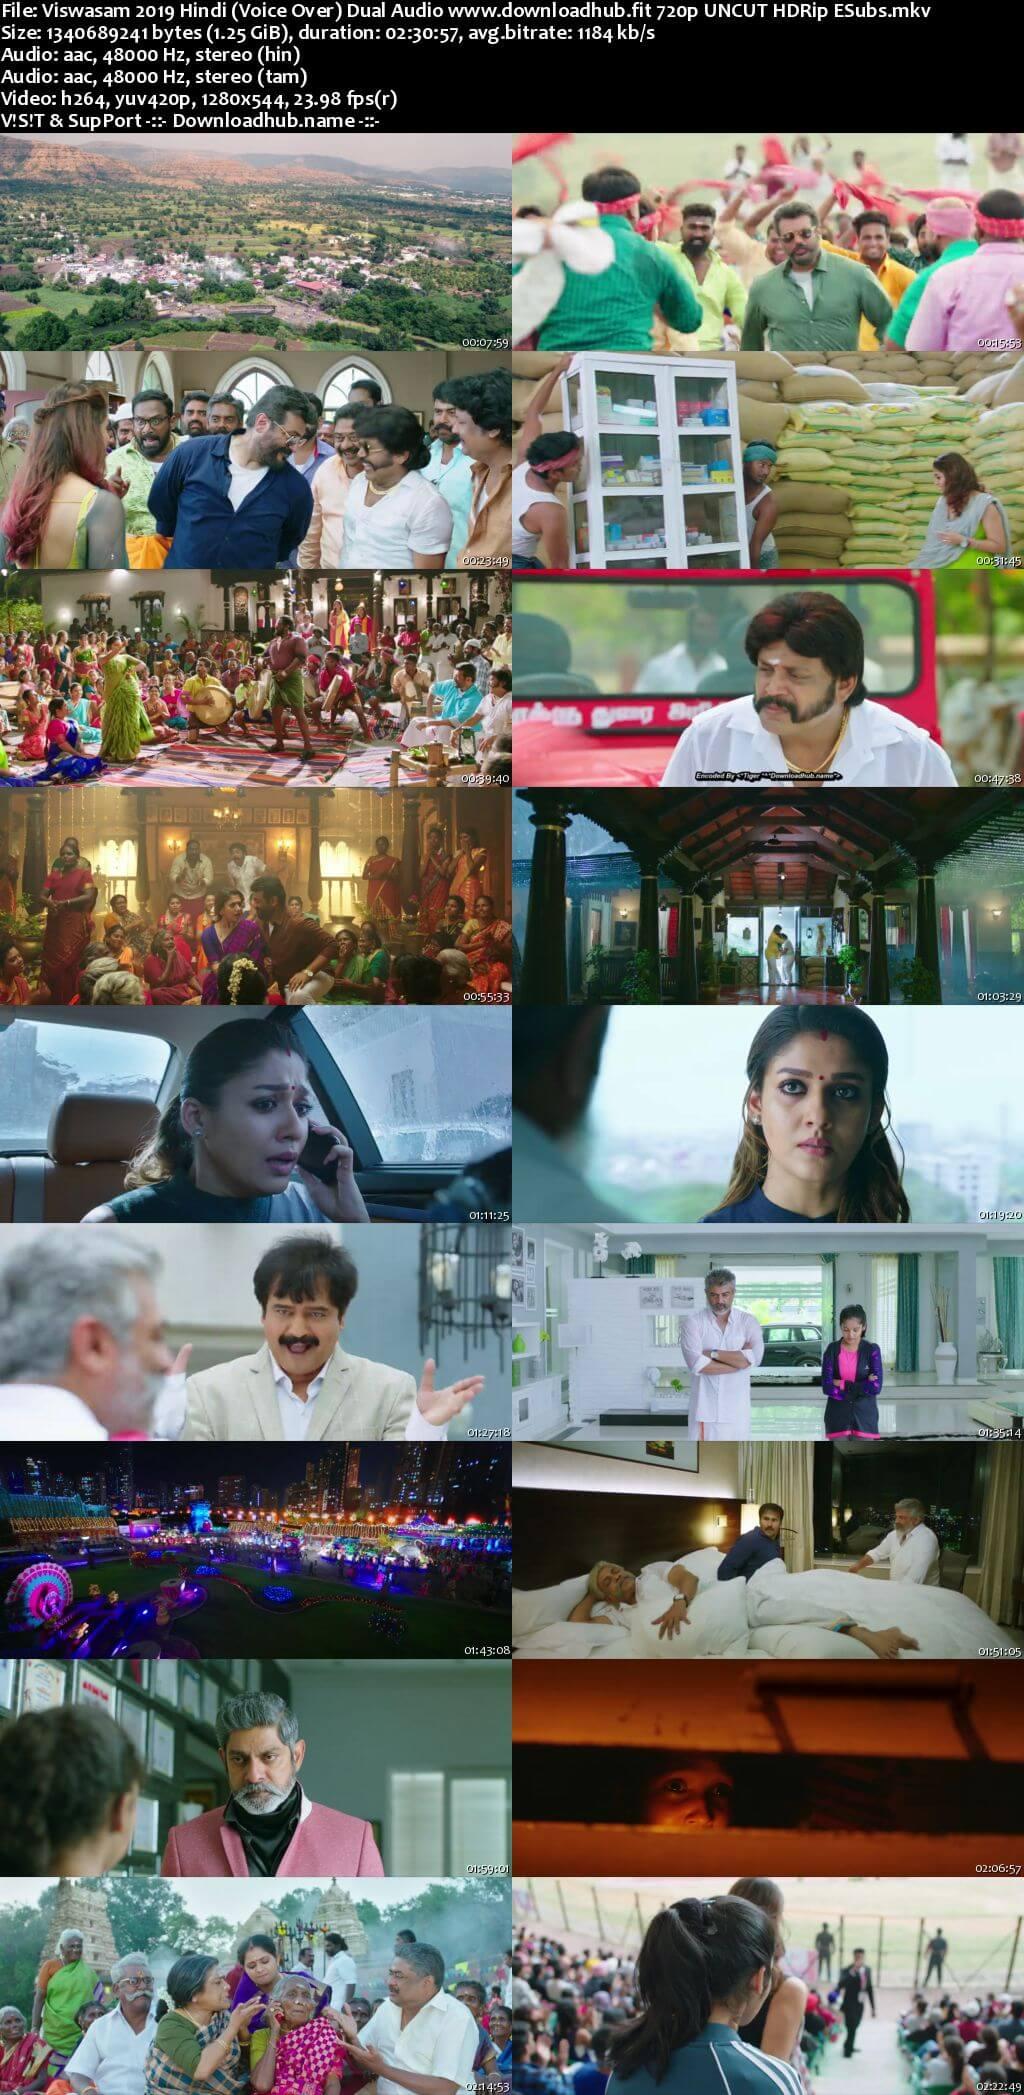 Viswasam 2019 Hindi (Voice Over) Dual Audio 720p 480p UNCUT HDRip ESubs